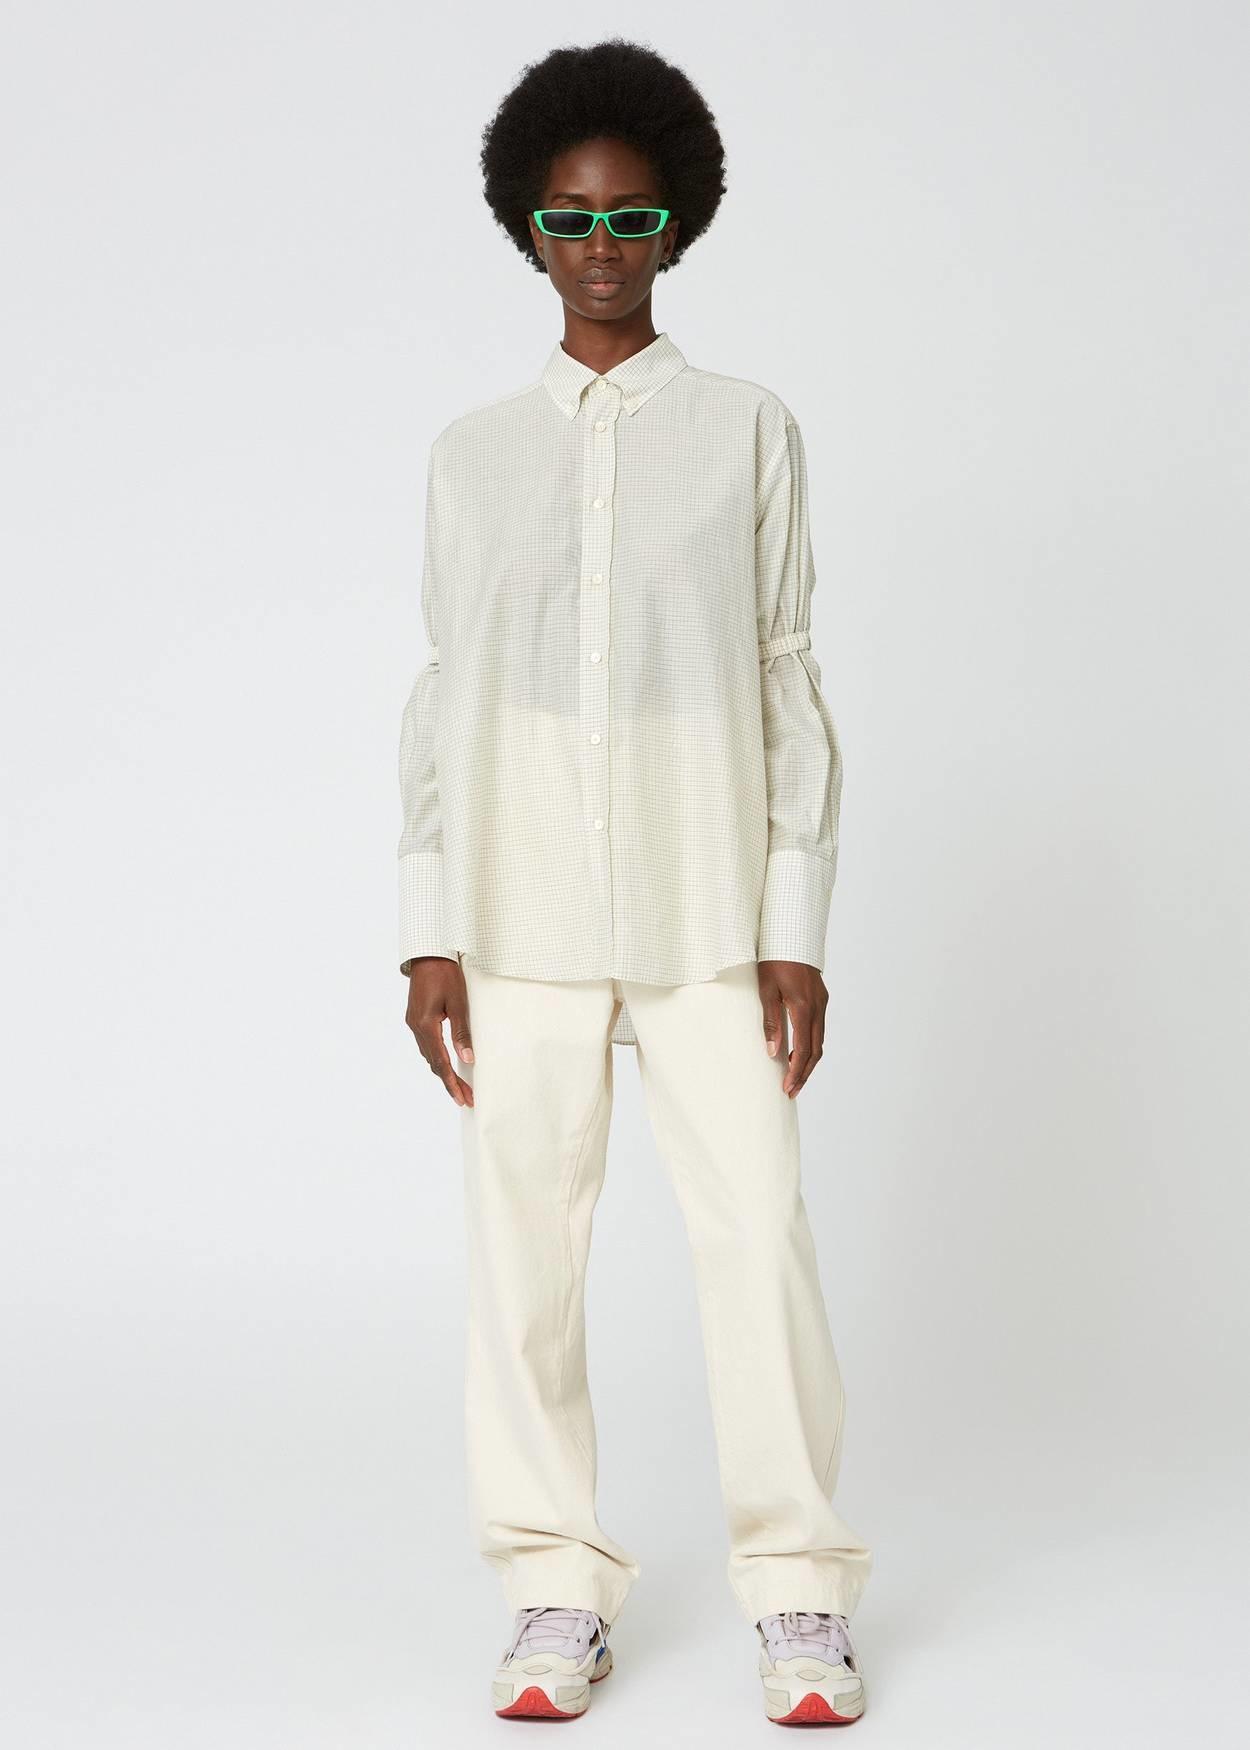 Trip Scrunchie Shirt White Check